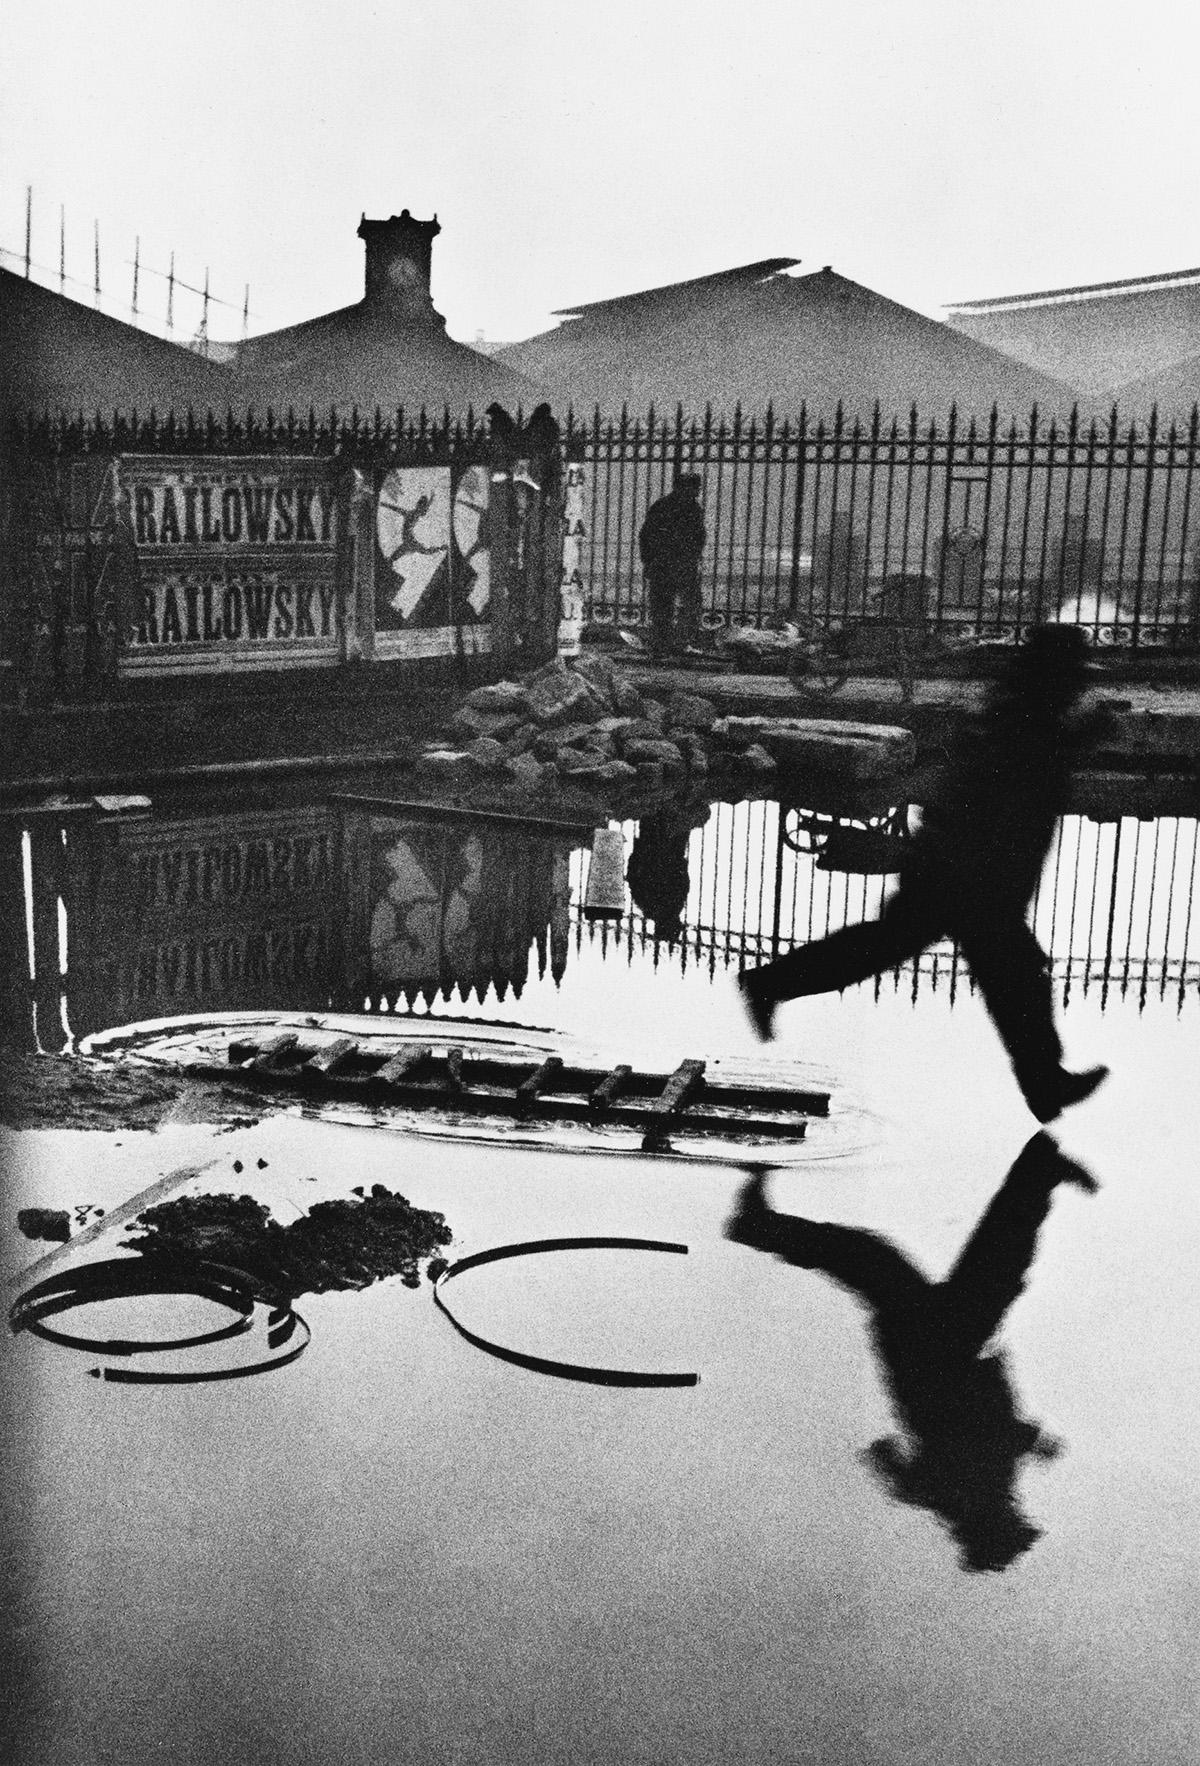 HENRI CARTIER-BRESSON (1908-2004) Behind the Gare St. Lazare.